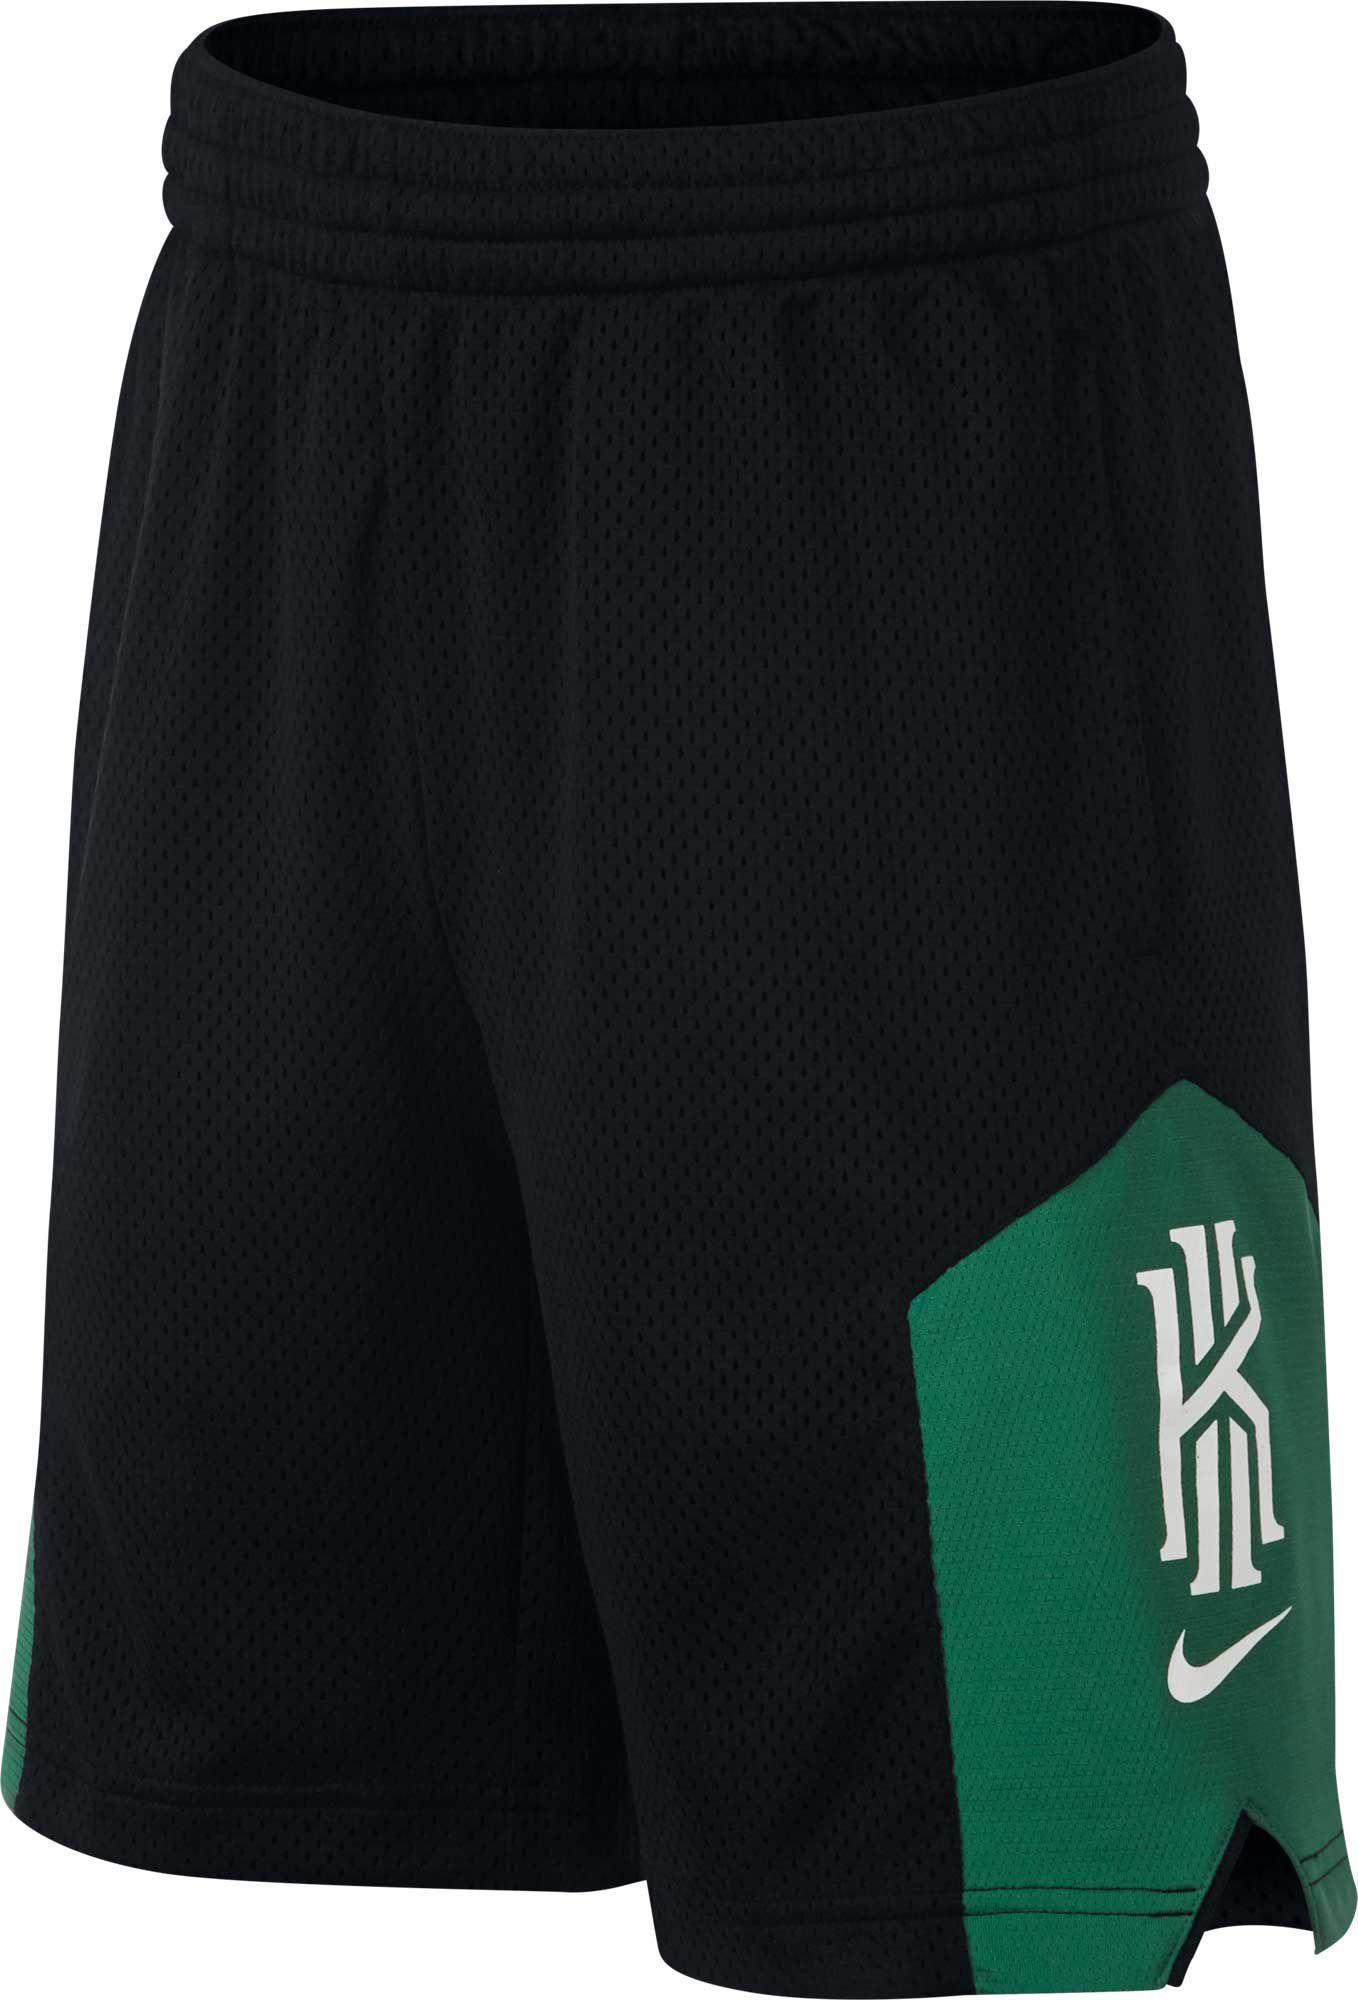 60c427f2dd6 Nike Boys' Kyrie Dri-FIT Graphic Basketball Shorts, Size: XS, Black ...